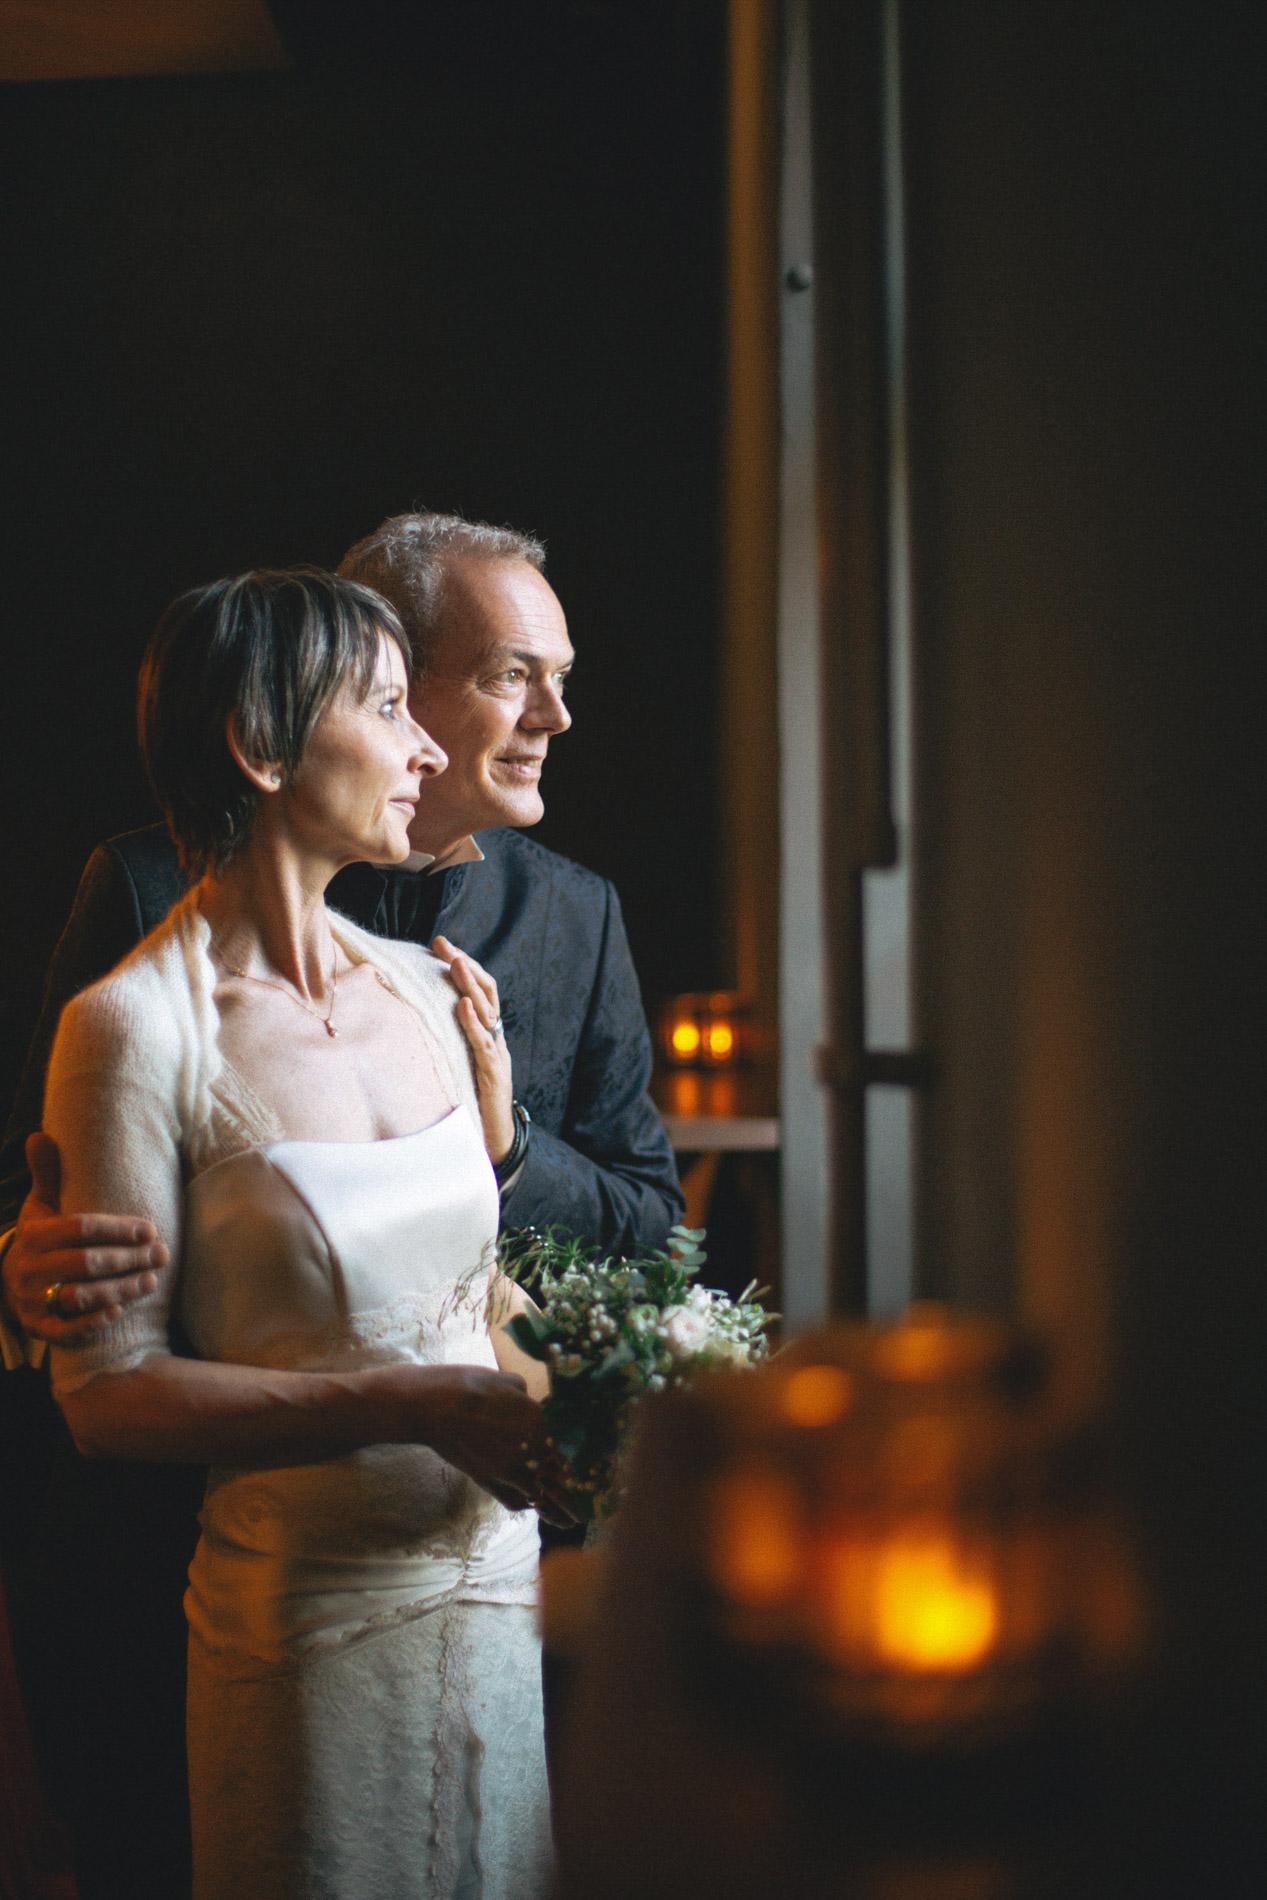 hochzeitsfotografie-schweiz_wedding-photographer-switzerland-europe_Bendik-Photography-082